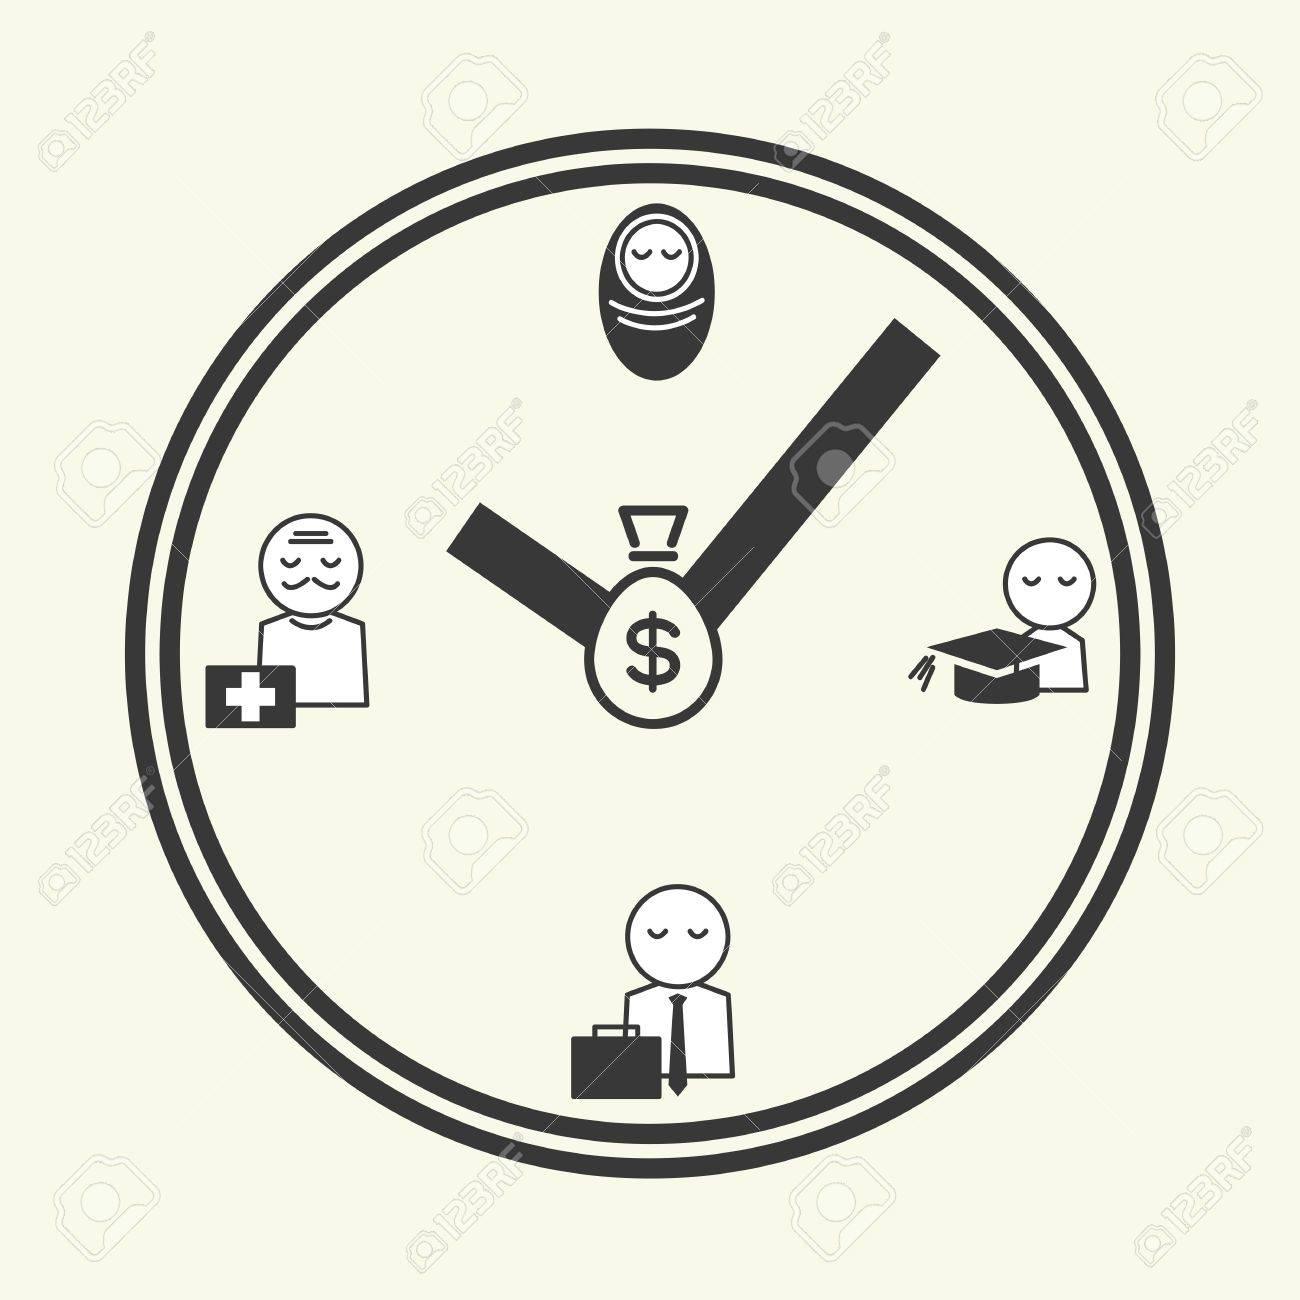 time of life, icon design vector Stock Vector - 20980879